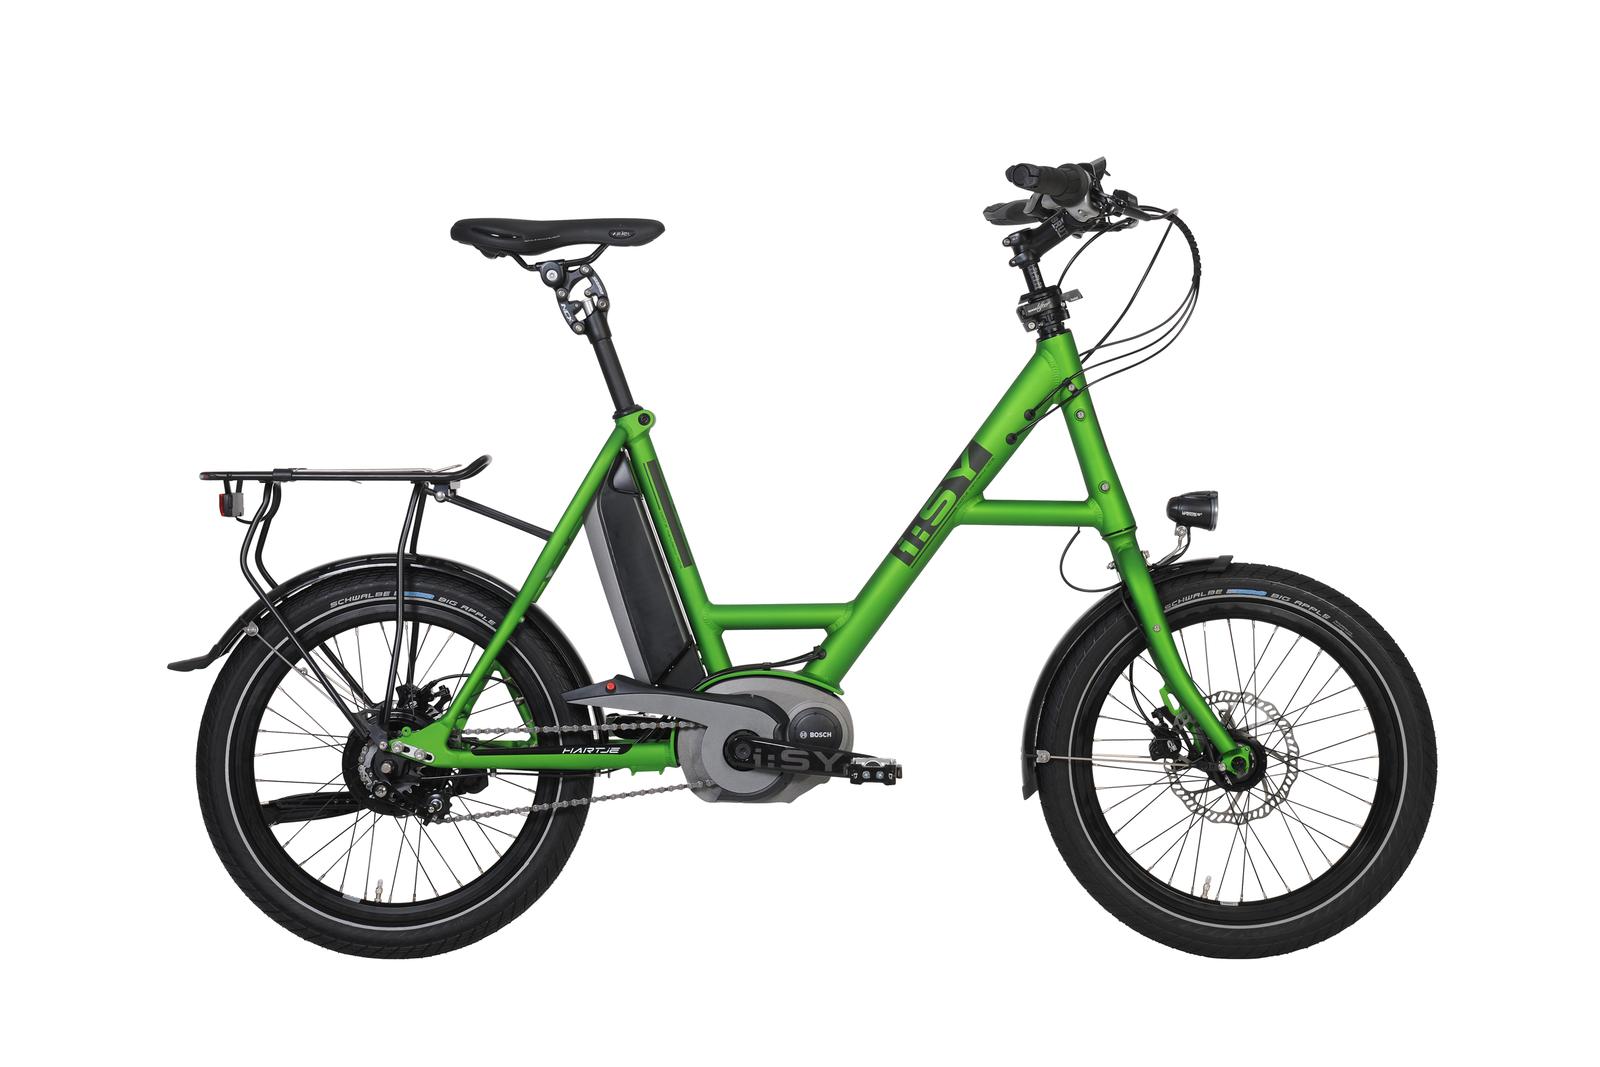 compacte e bikes bij hermann hartje. Black Bedroom Furniture Sets. Home Design Ideas